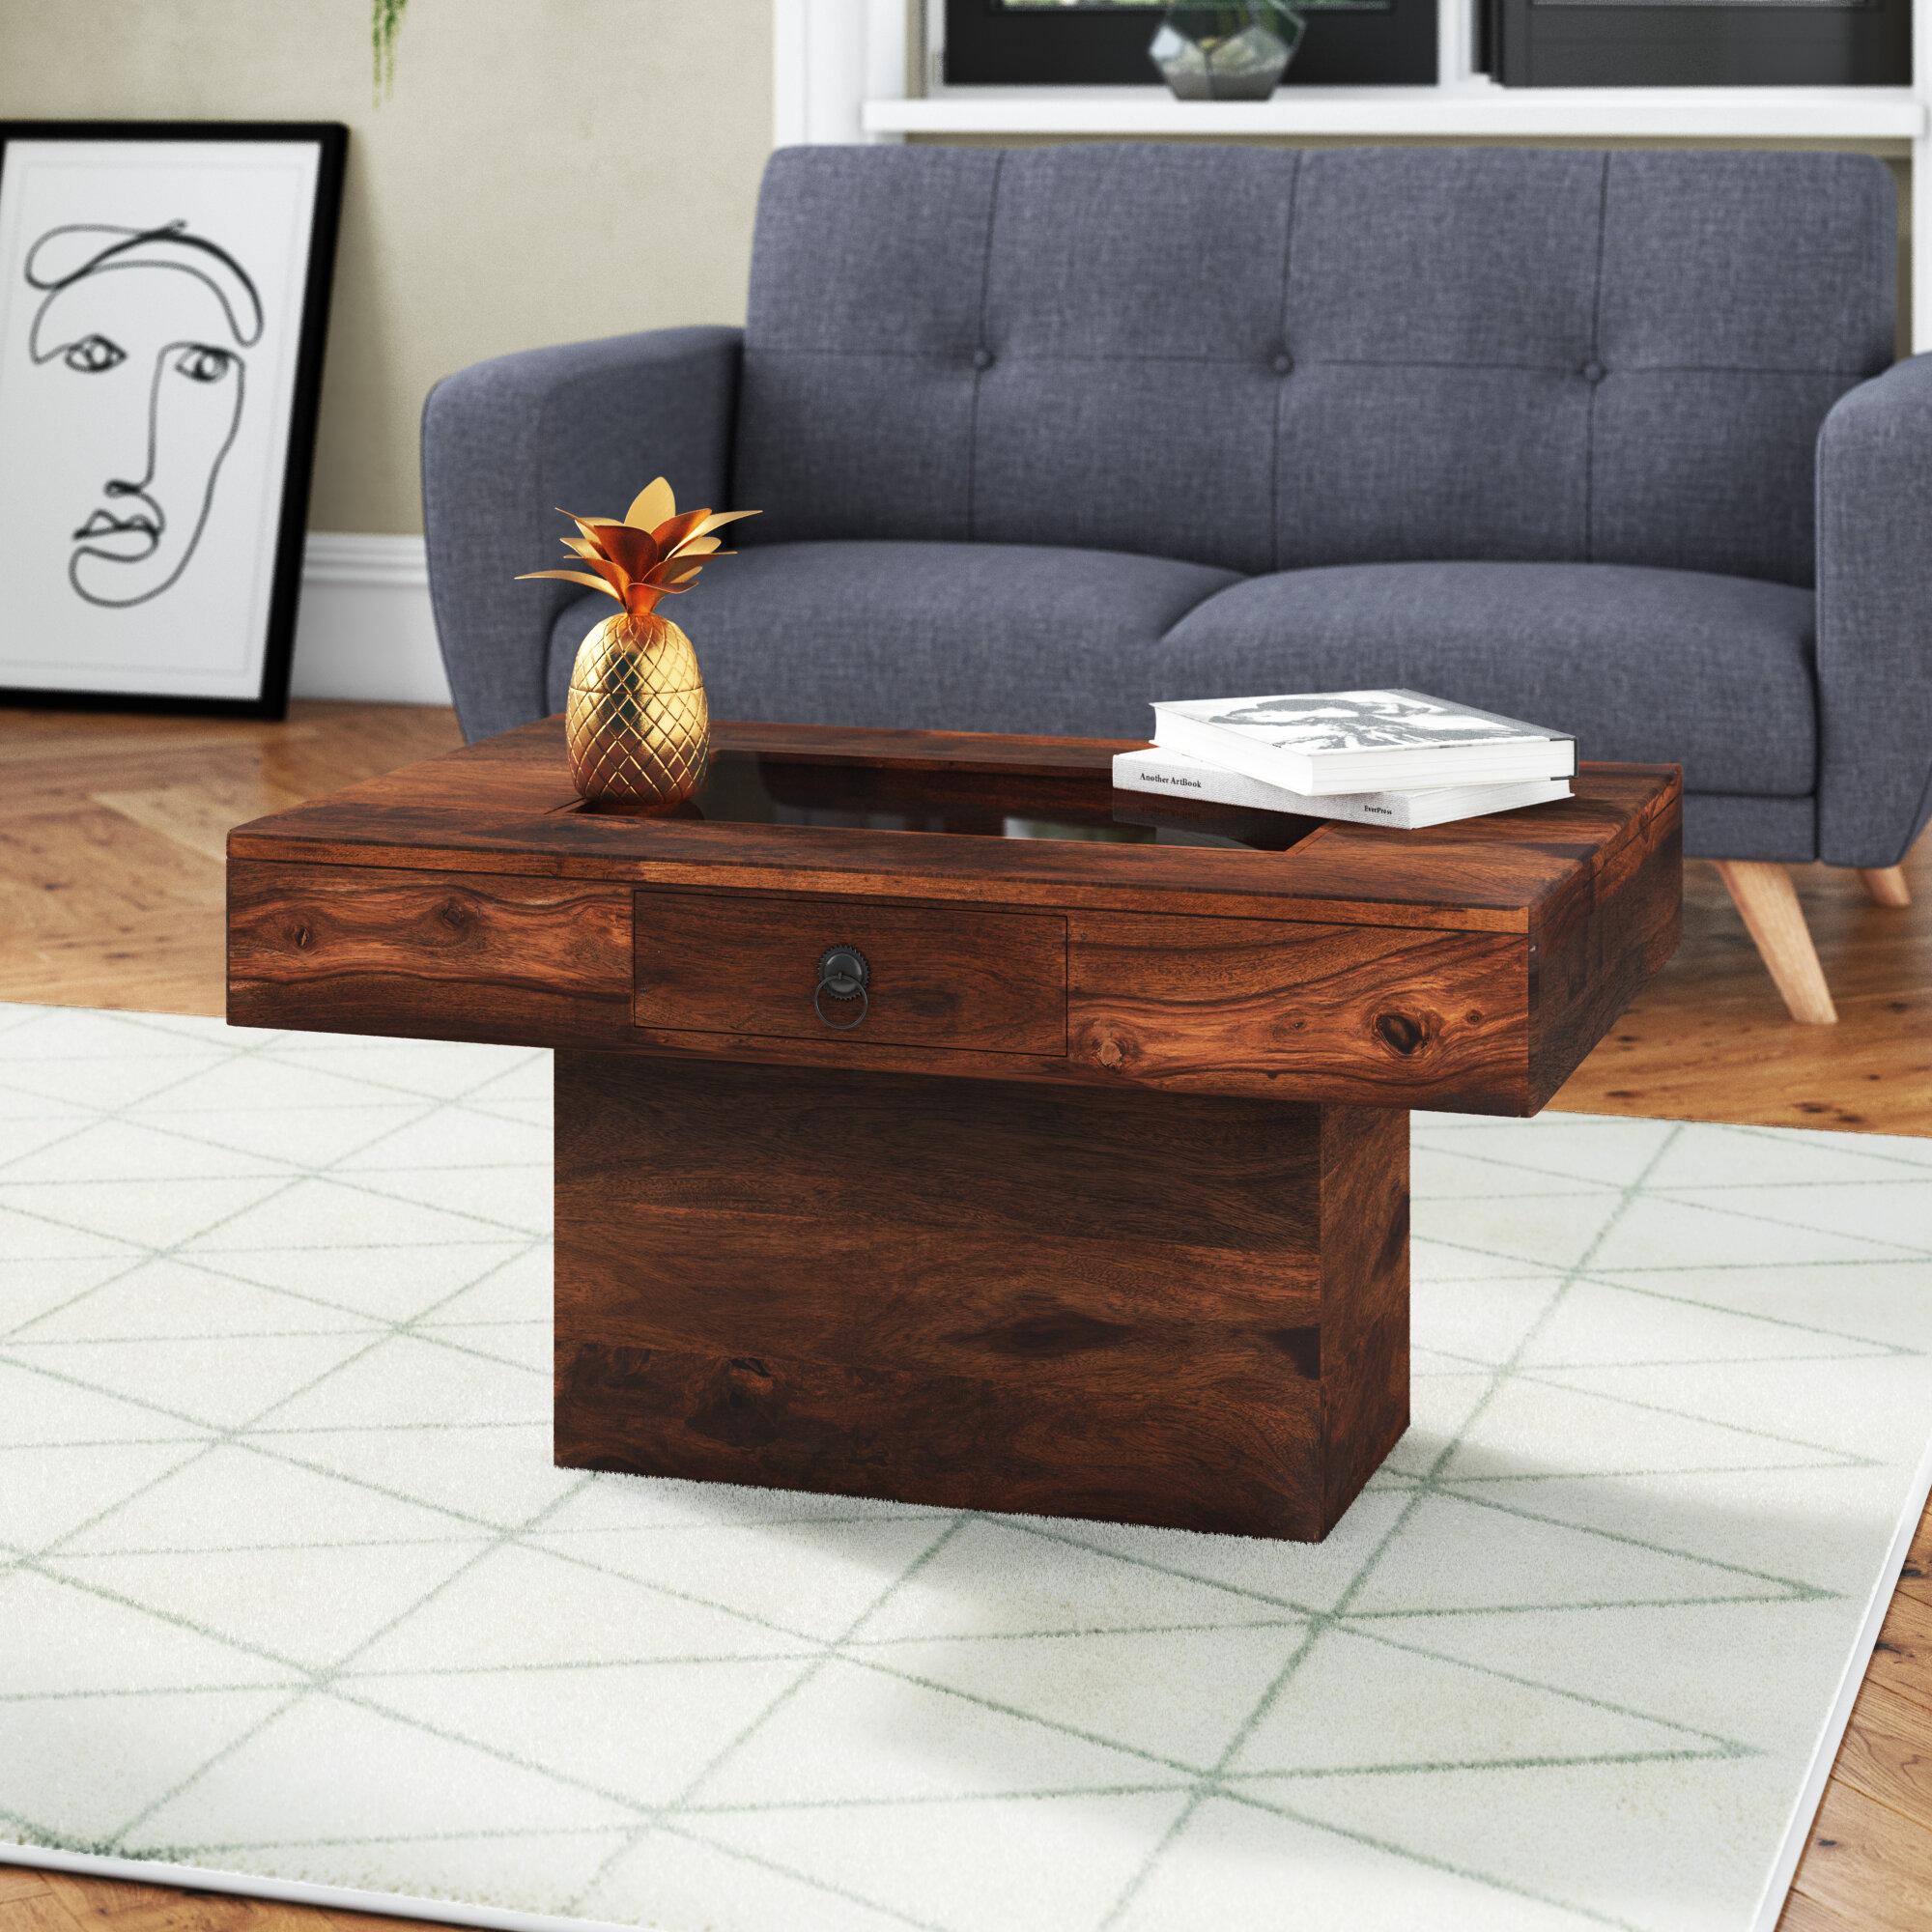 Prestington Jali Indian Coffee Table With Storage Reviews Wayfair Co Uk